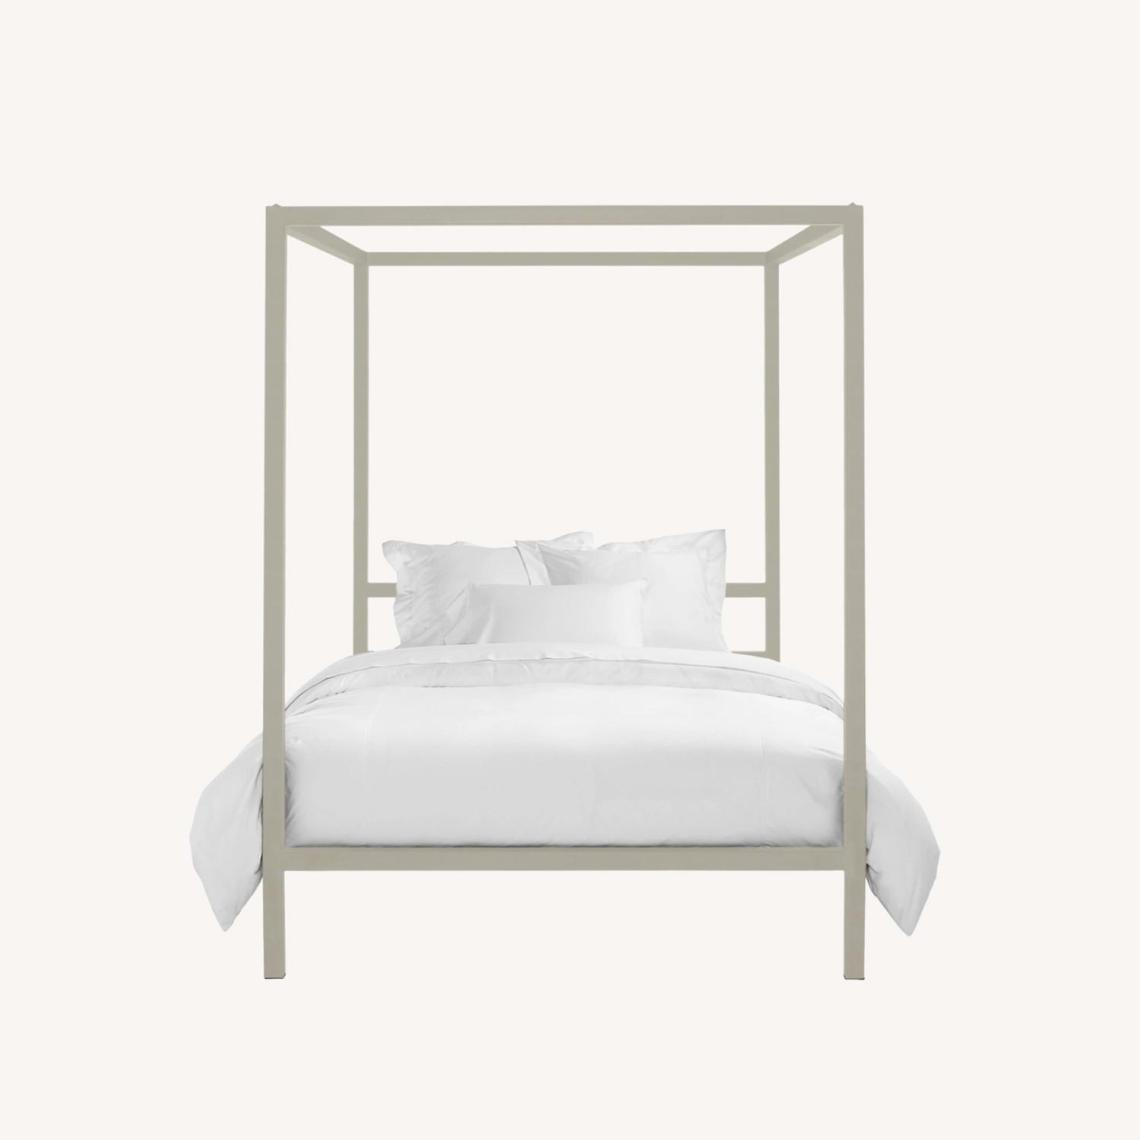 Room Board Architecture Bed Queen Aptdeco